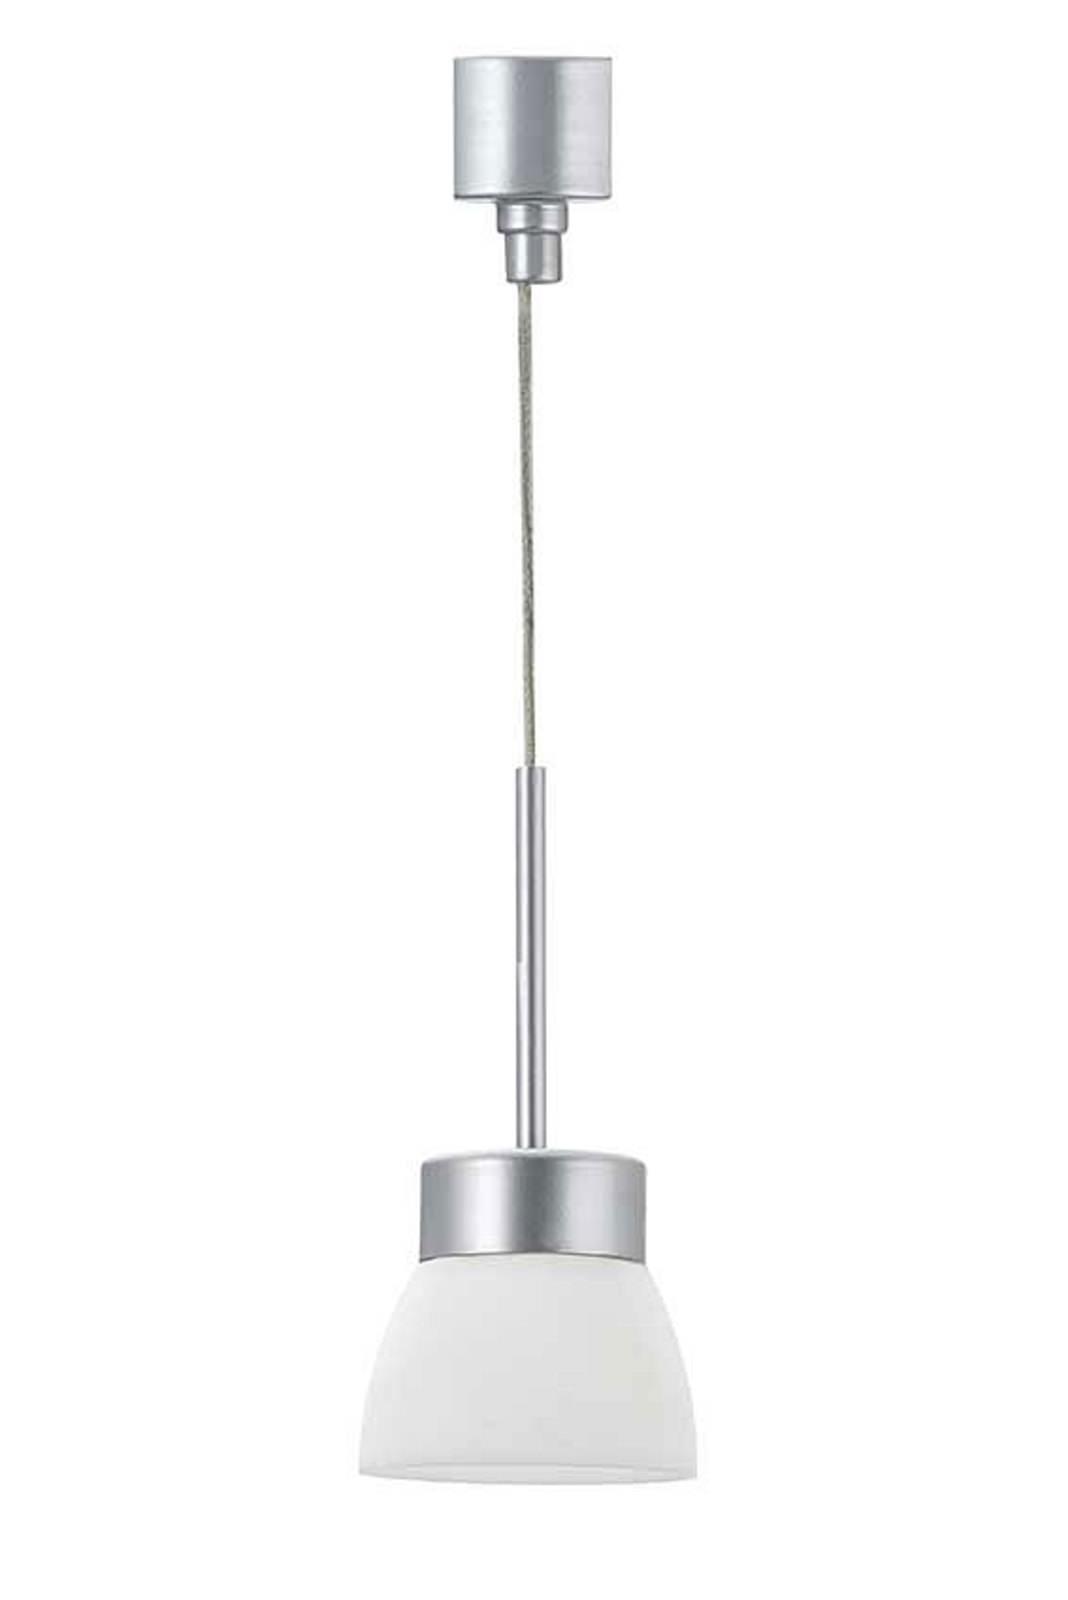 briloner leuchten led adapterpendel 1flg bl6000 online entdecken knuffmann ihr m belhaus. Black Bedroom Furniture Sets. Home Design Ideas